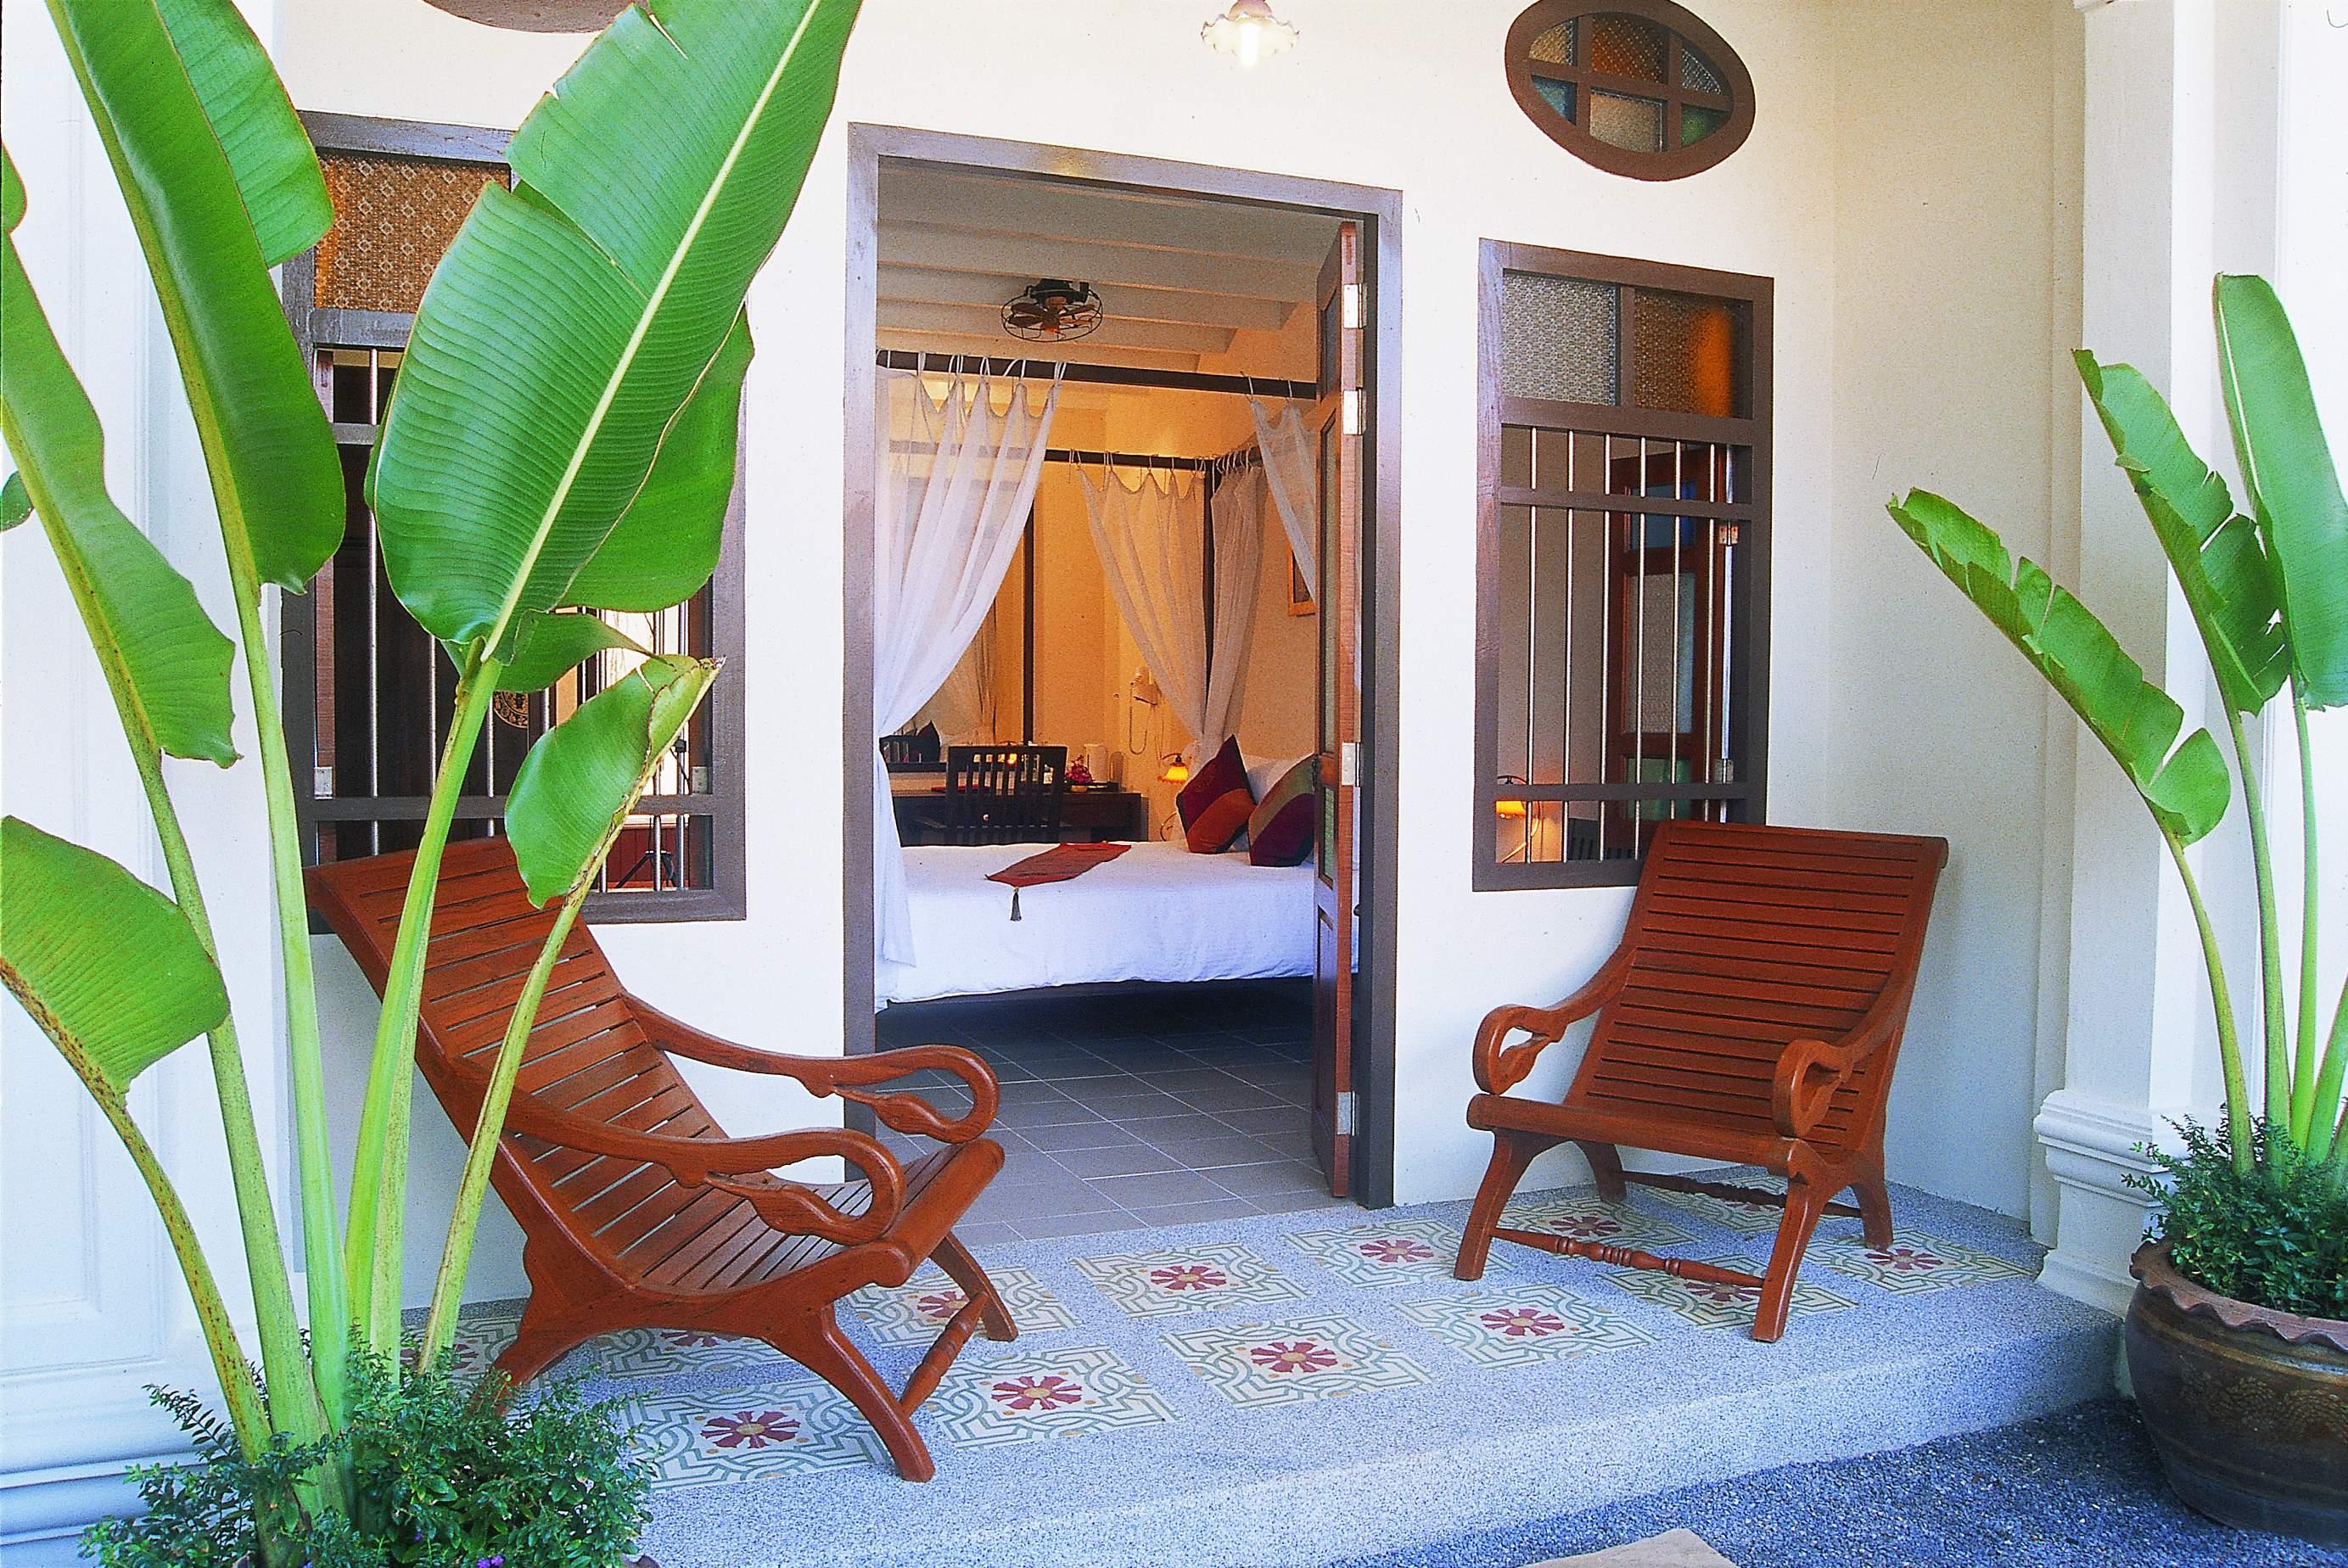 The Old Phuket - Karon Beach Resort, Pulau Phuket